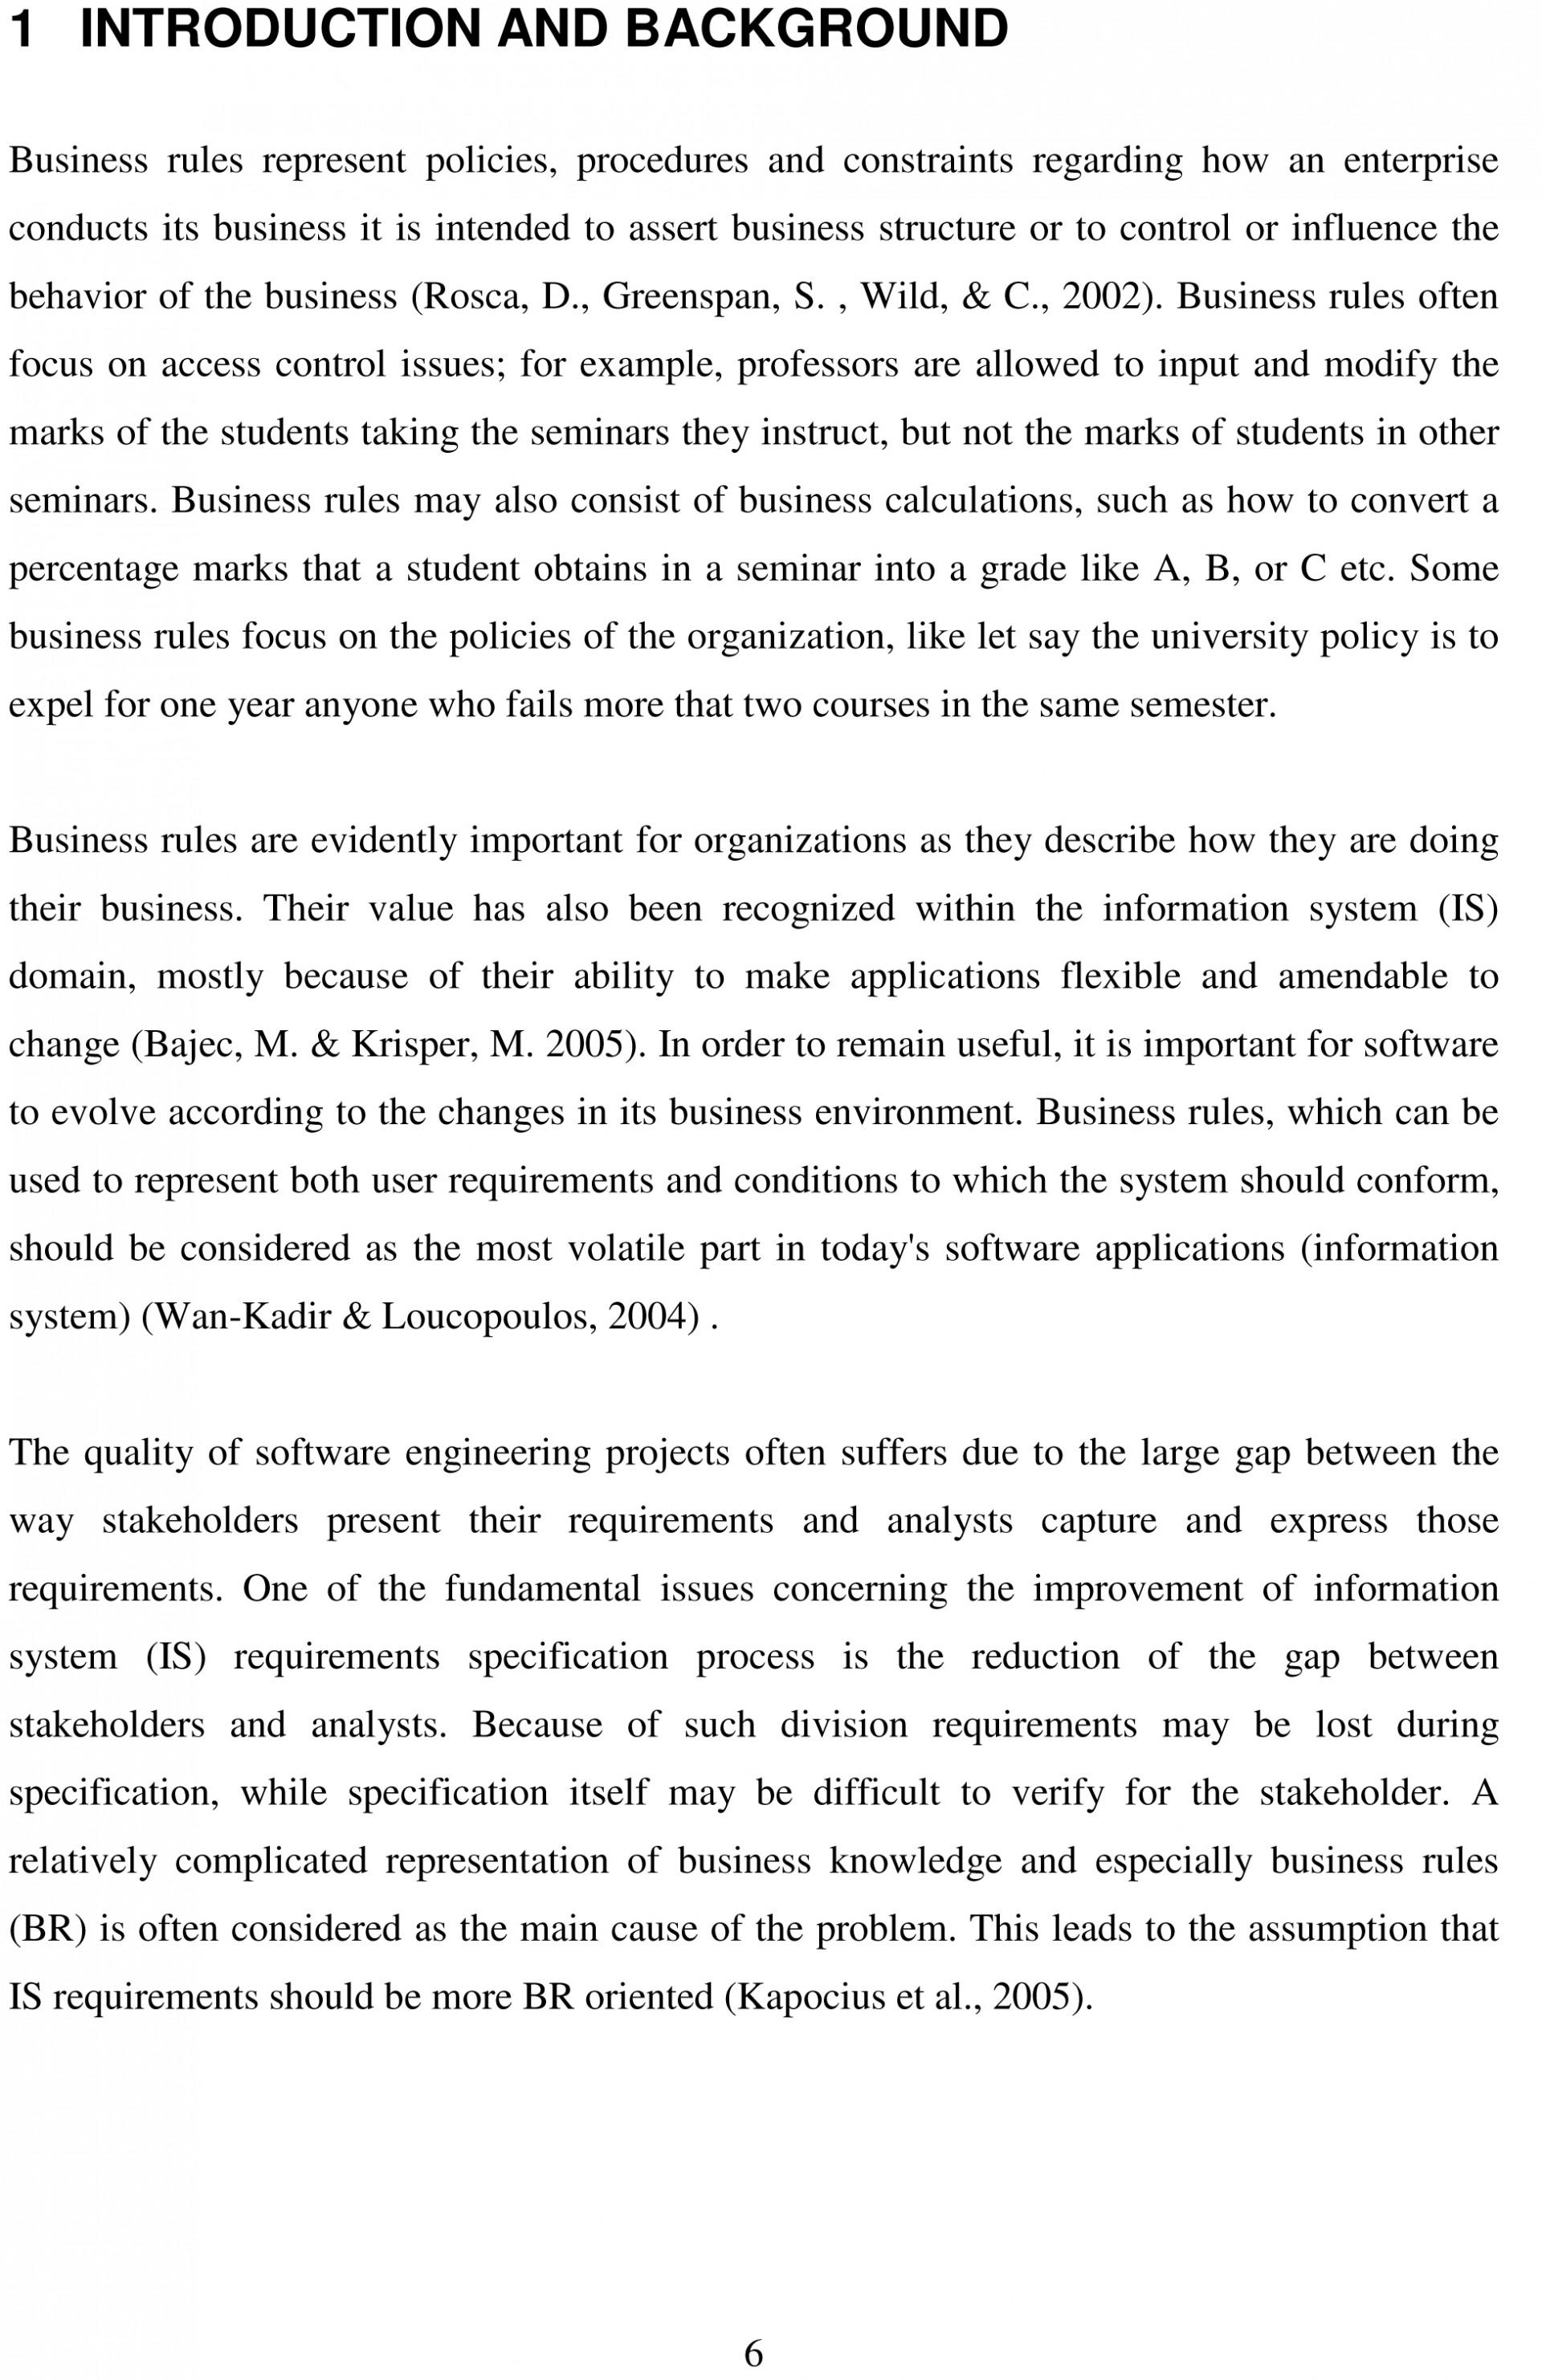 025 Essay Example Free Essays Thesis Singular 123 Easy 1920